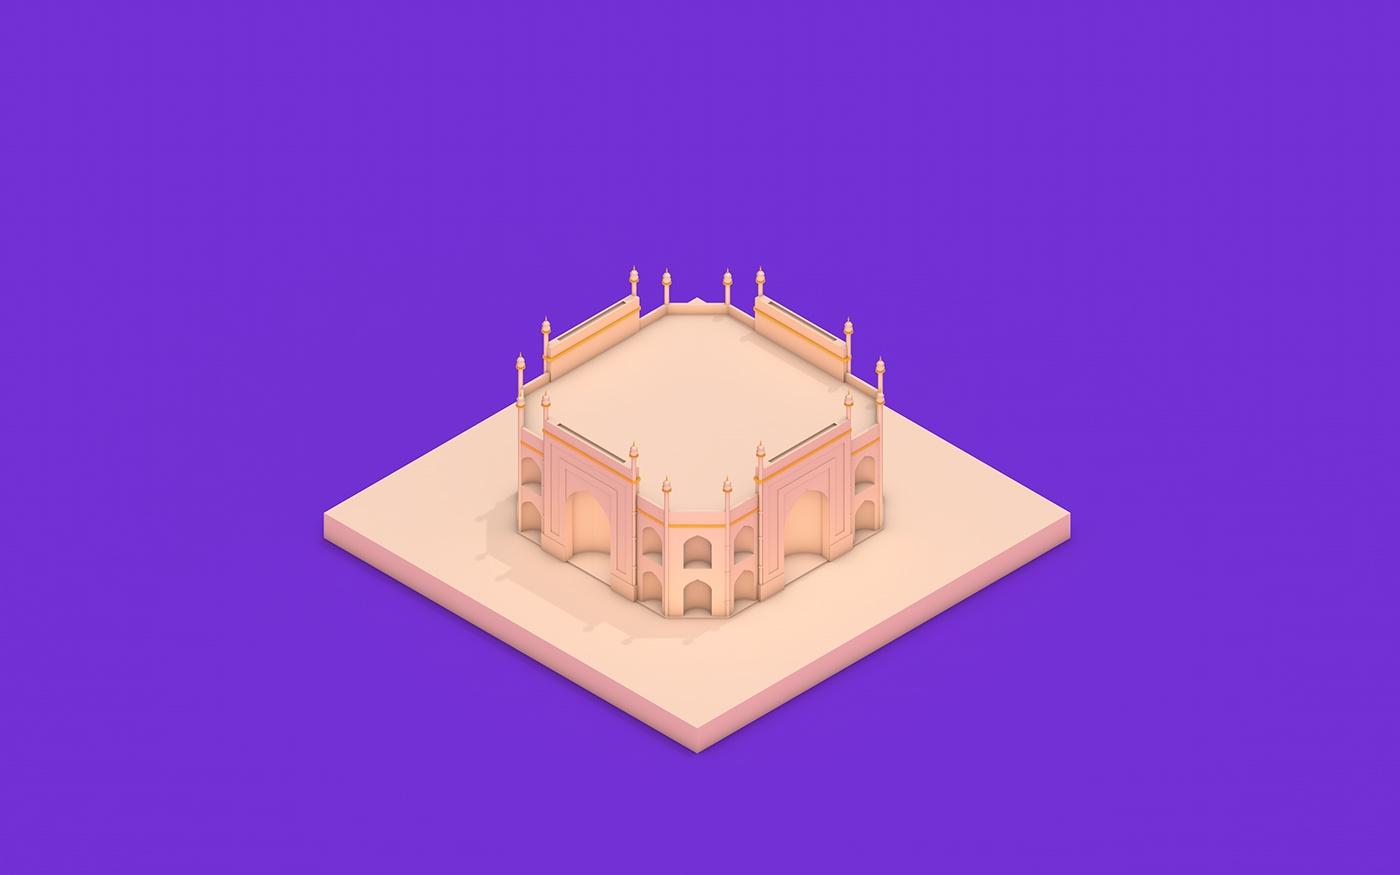 3D,cinema4d,c4d,Tajmahal,Love,Isometric,models,building,India,architecture